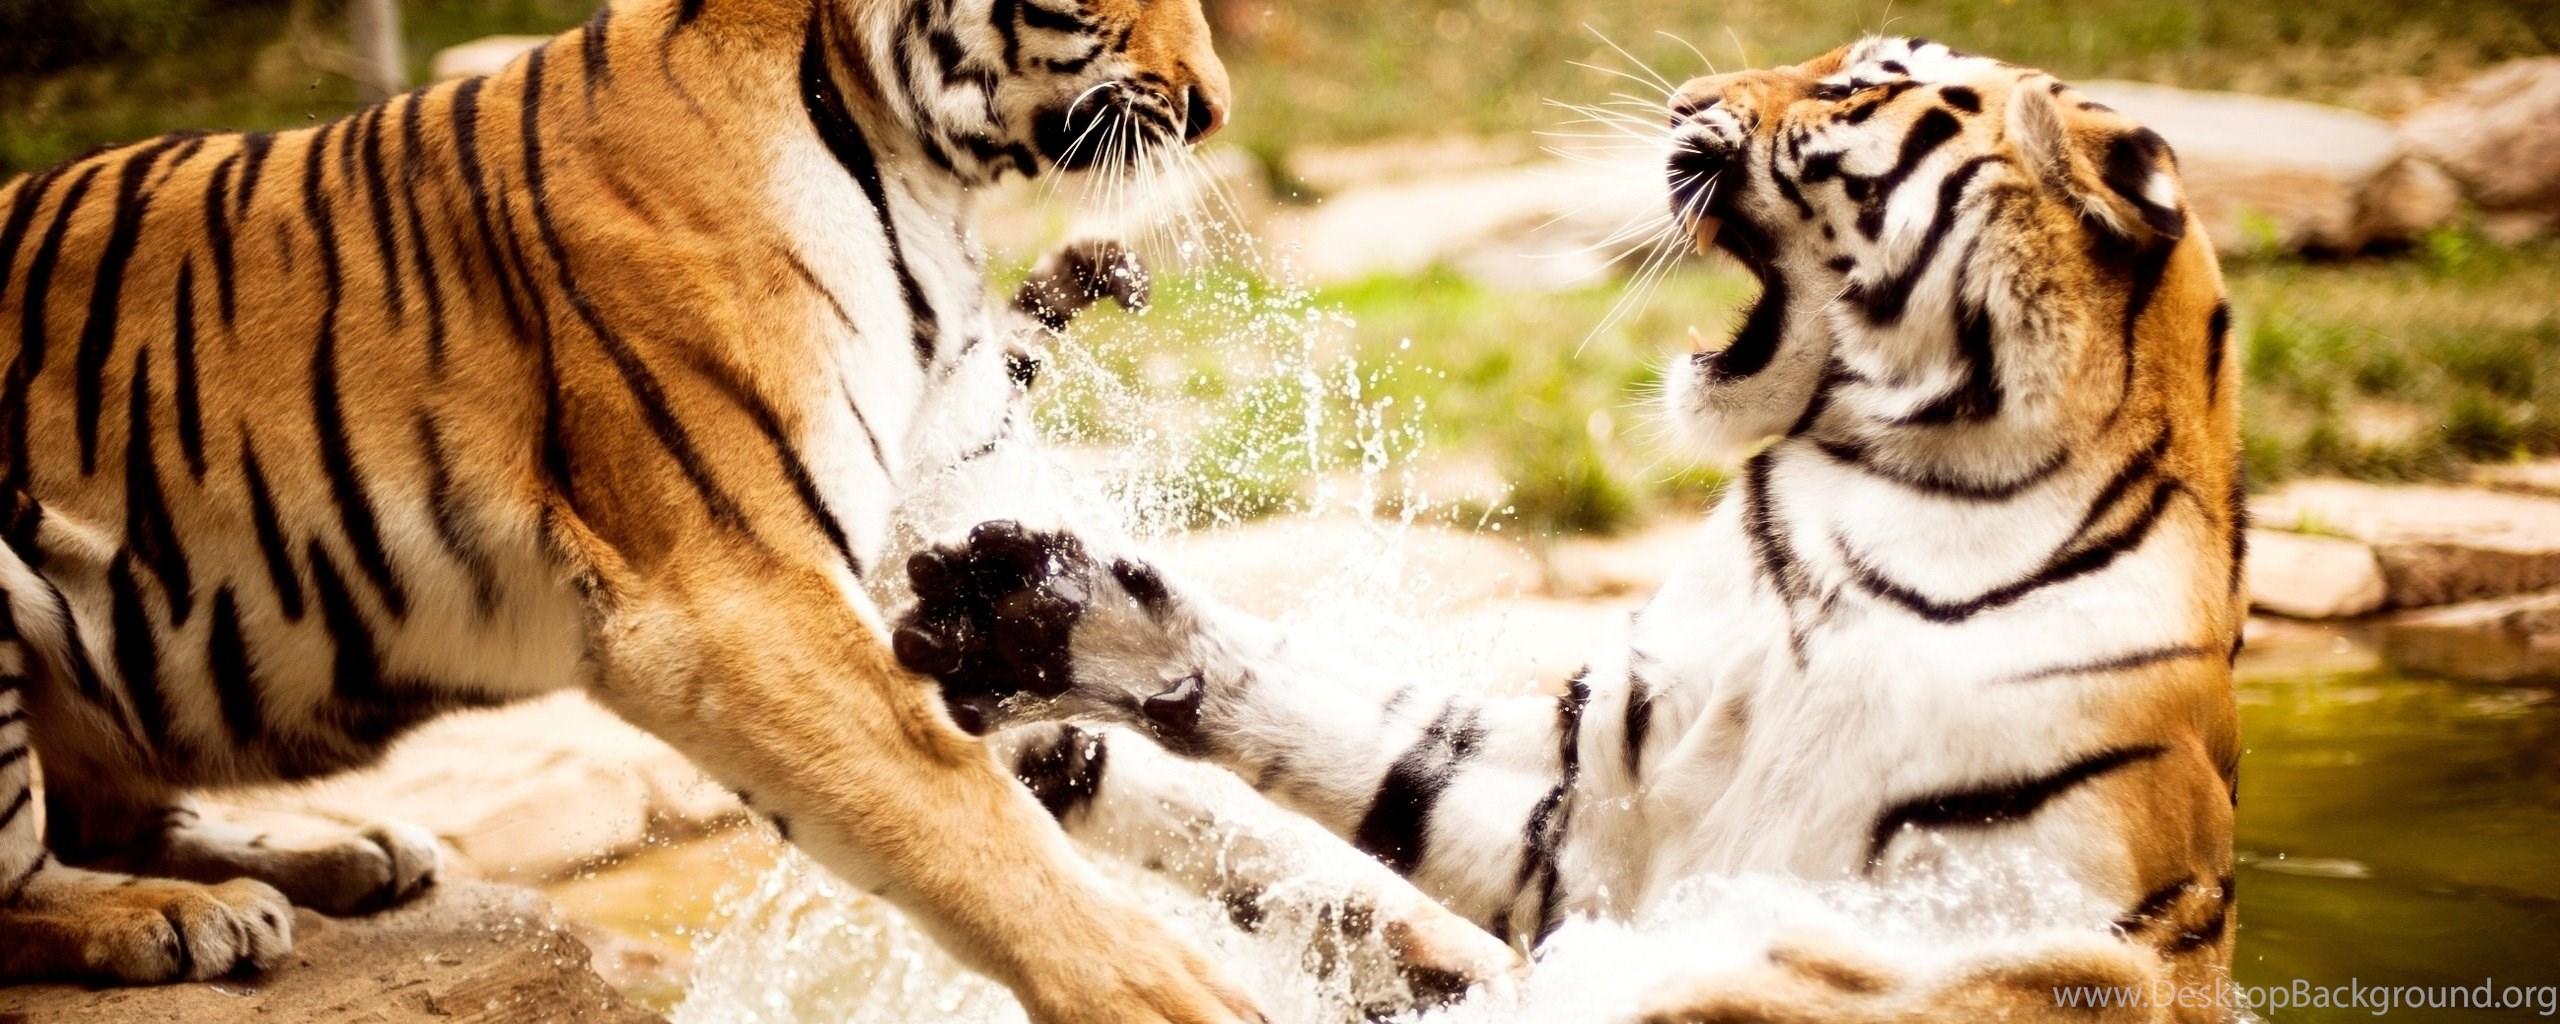 Tigers fighting wallpaper